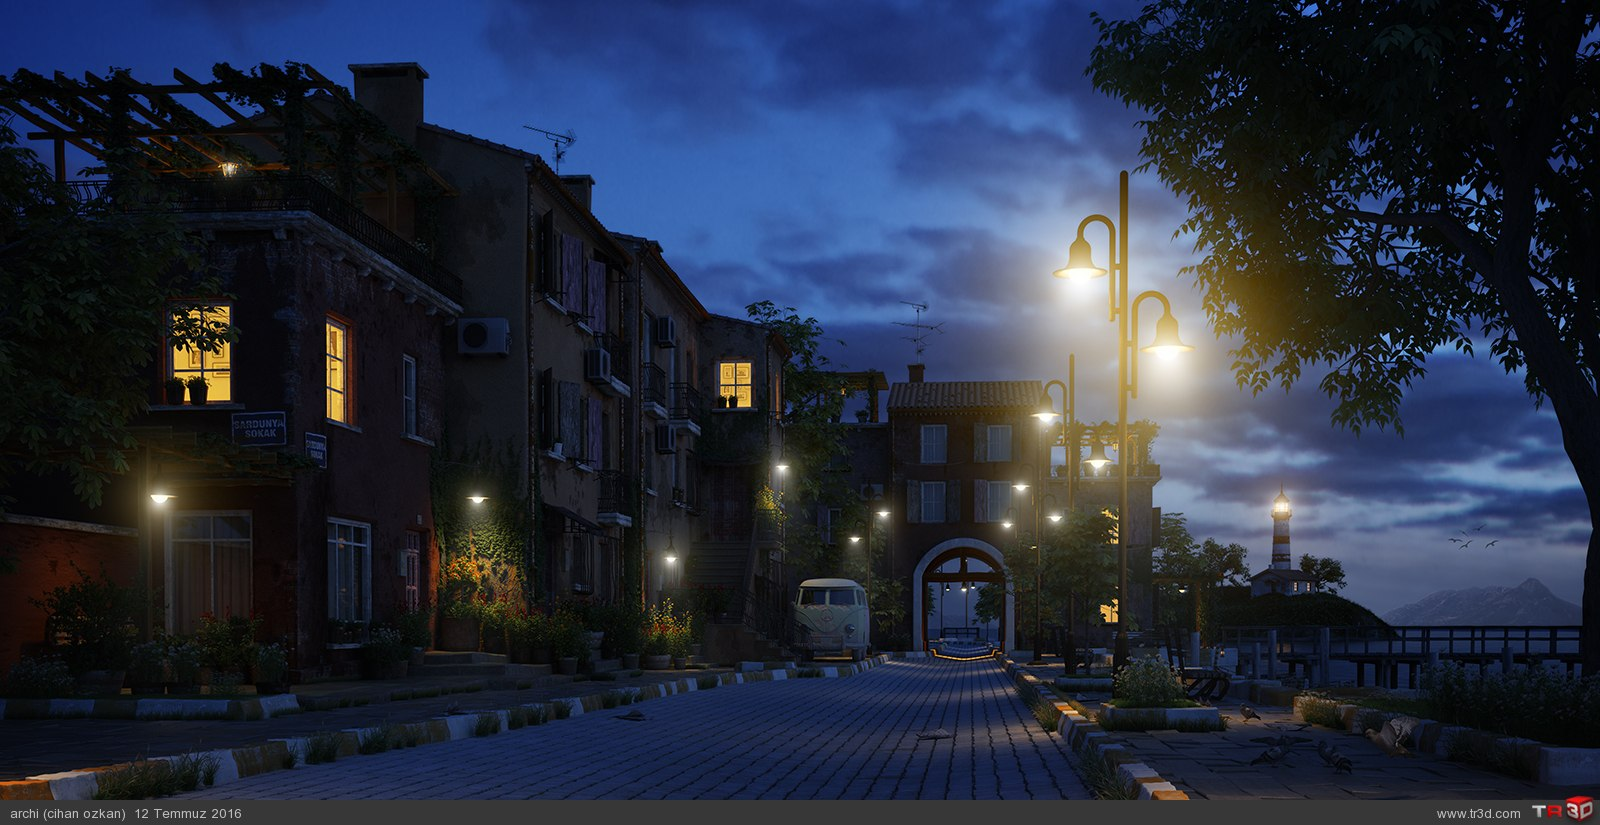 Sardunya Sokak